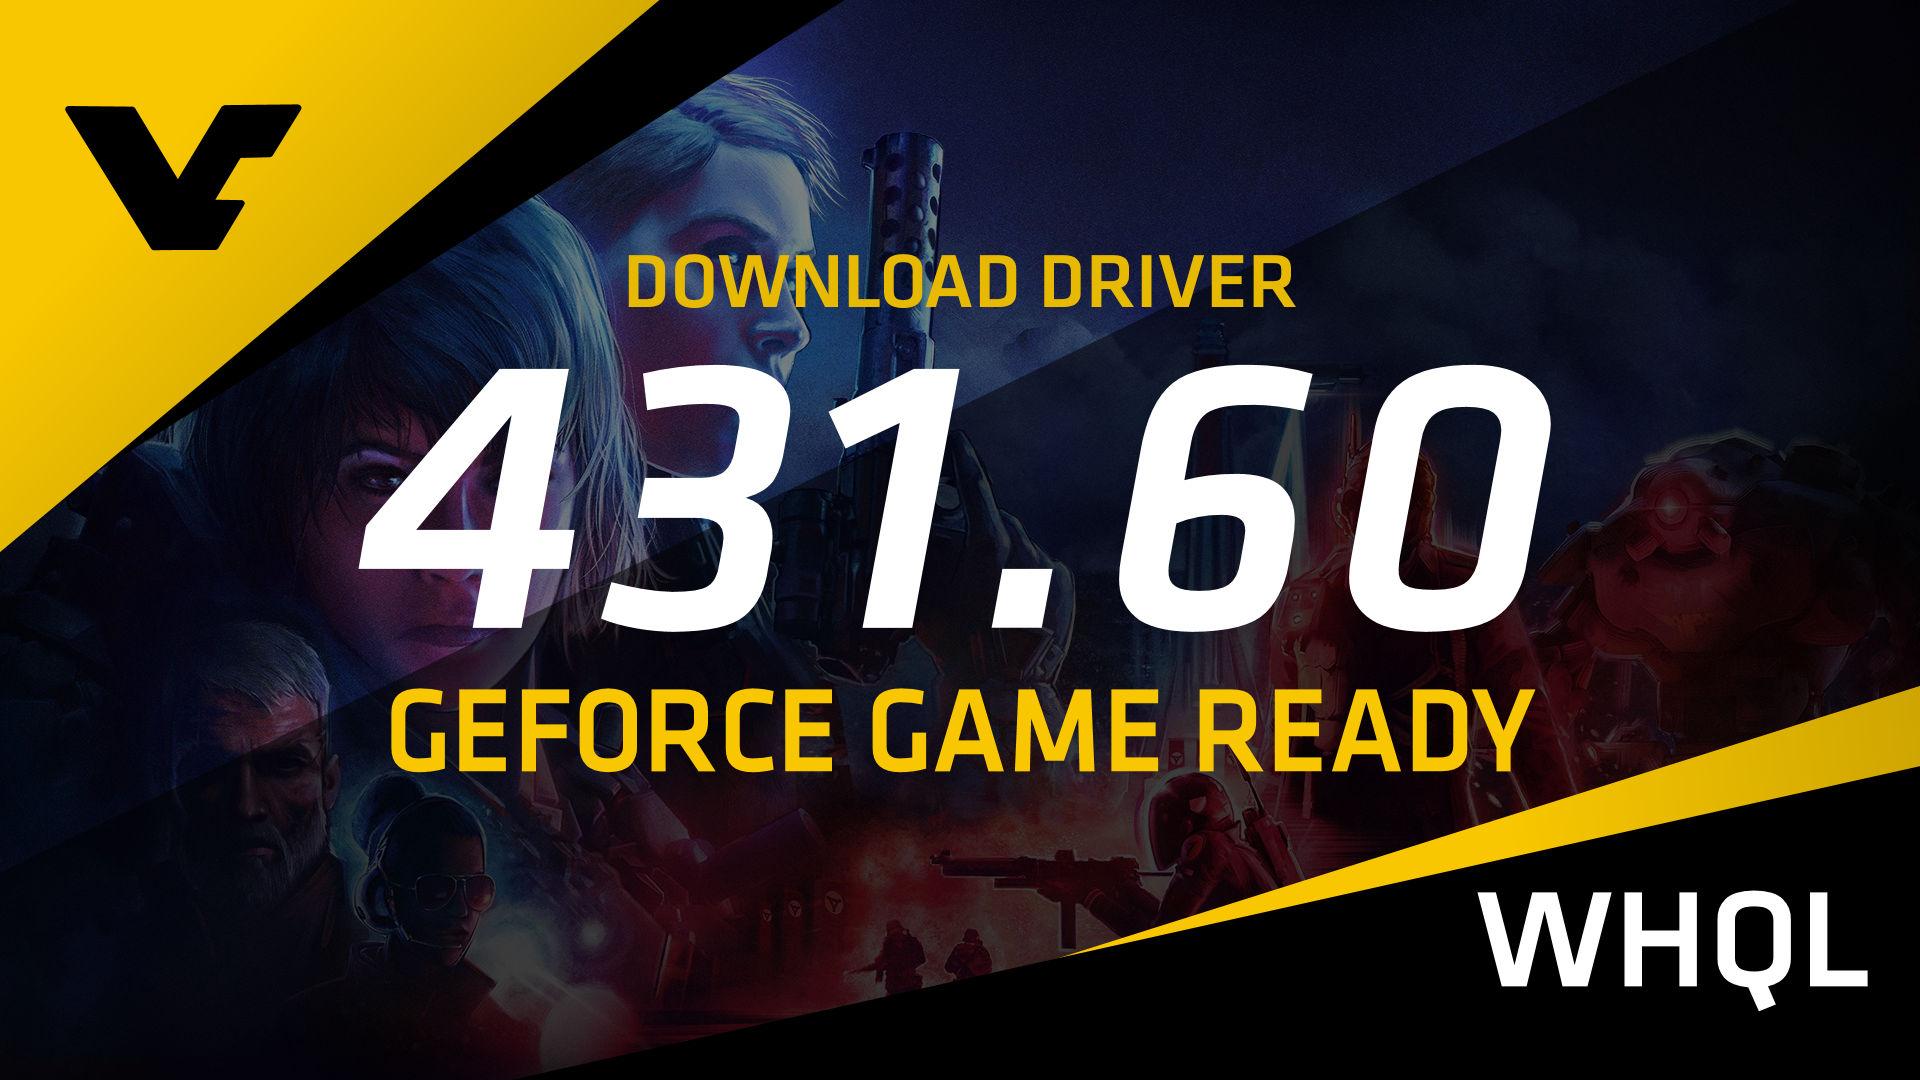 NVIDIA GeForce Game Ready 431 60 WHQL - VideoCardz com